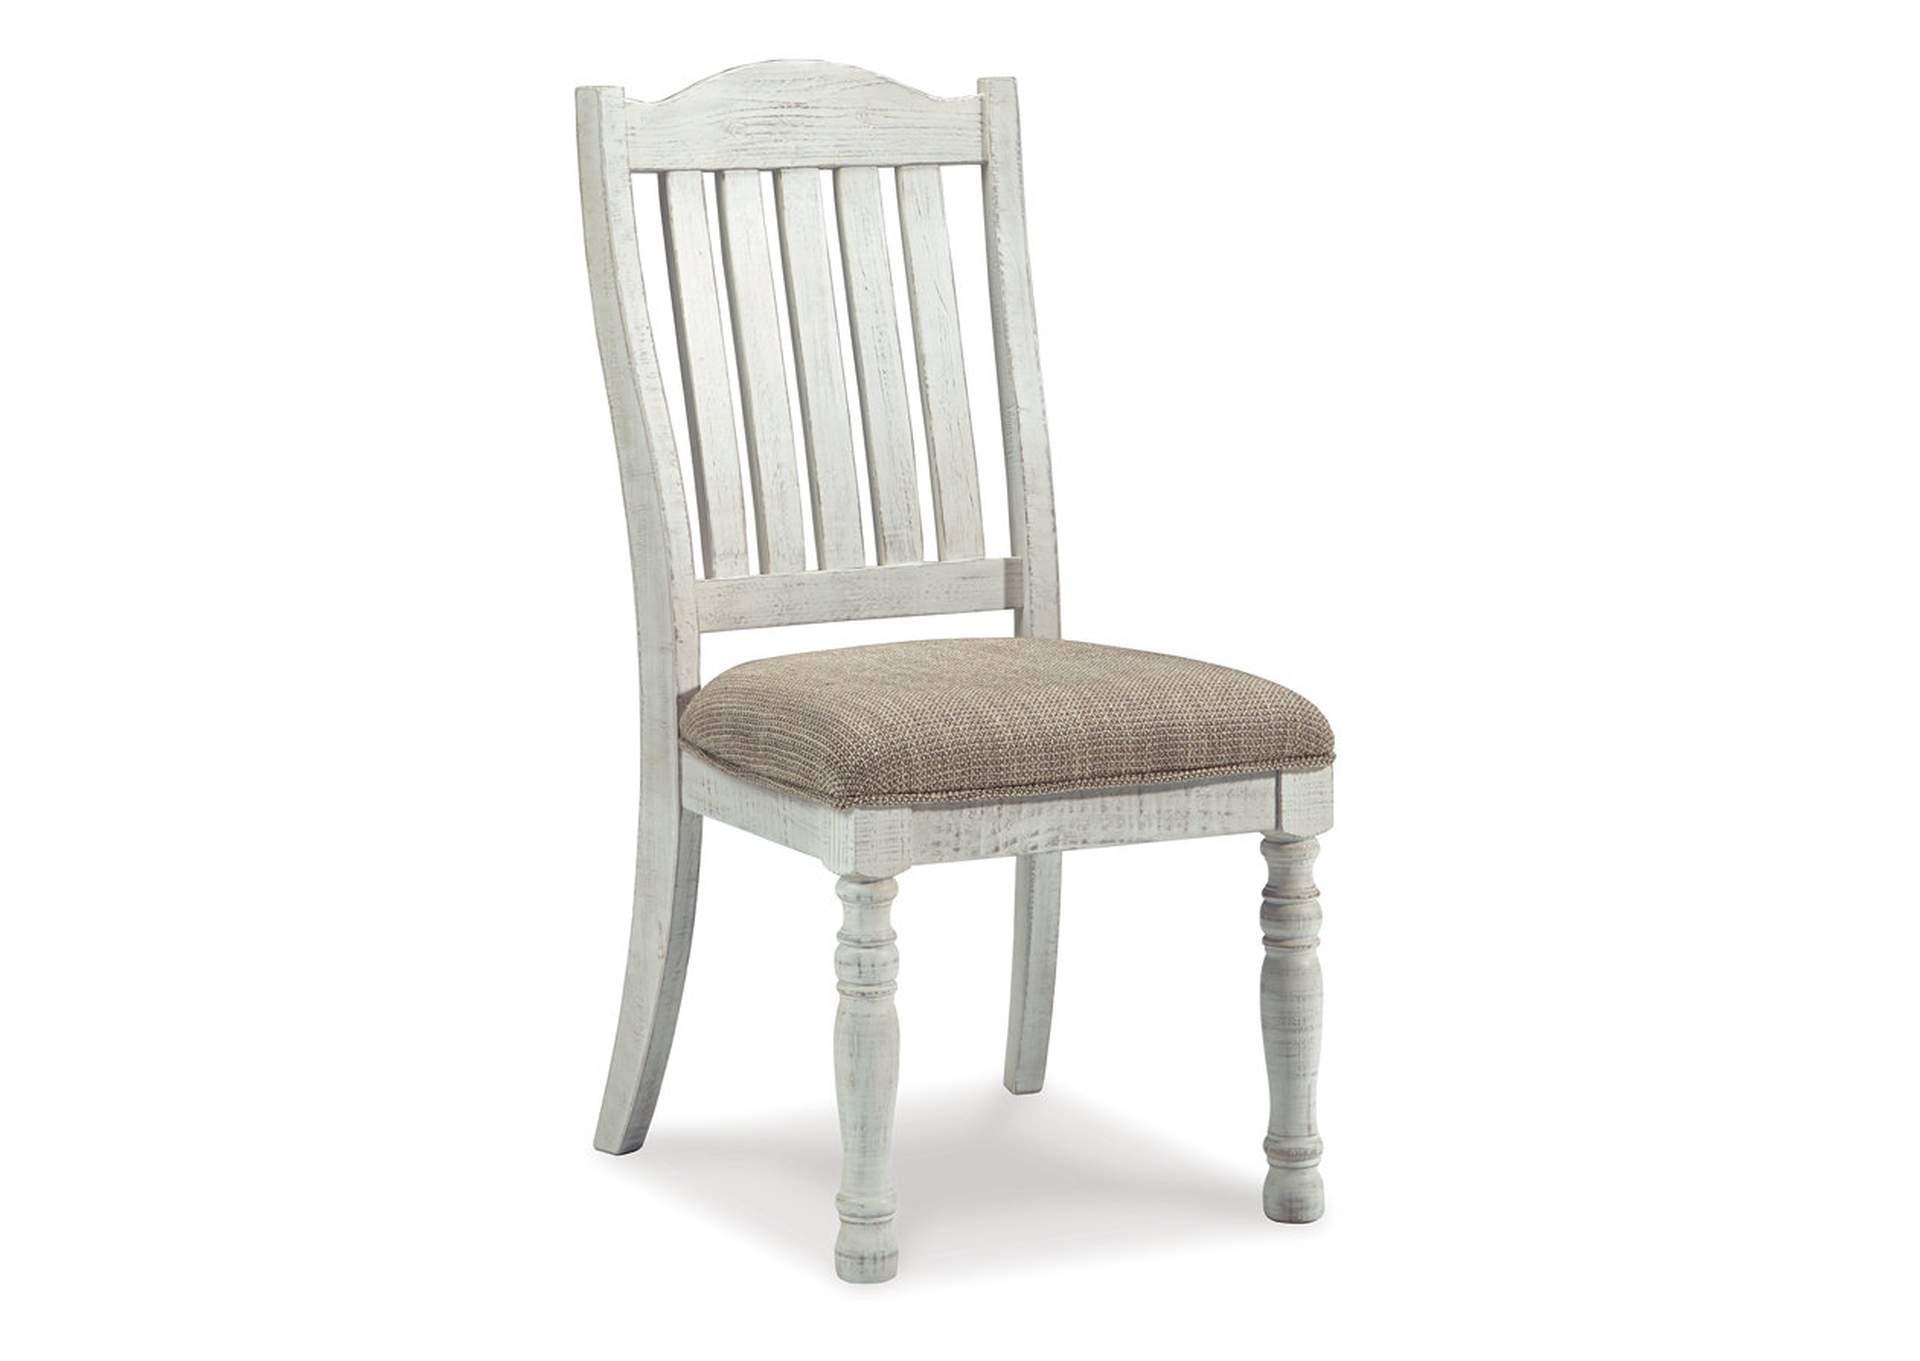 Havalance Dining Room Chair